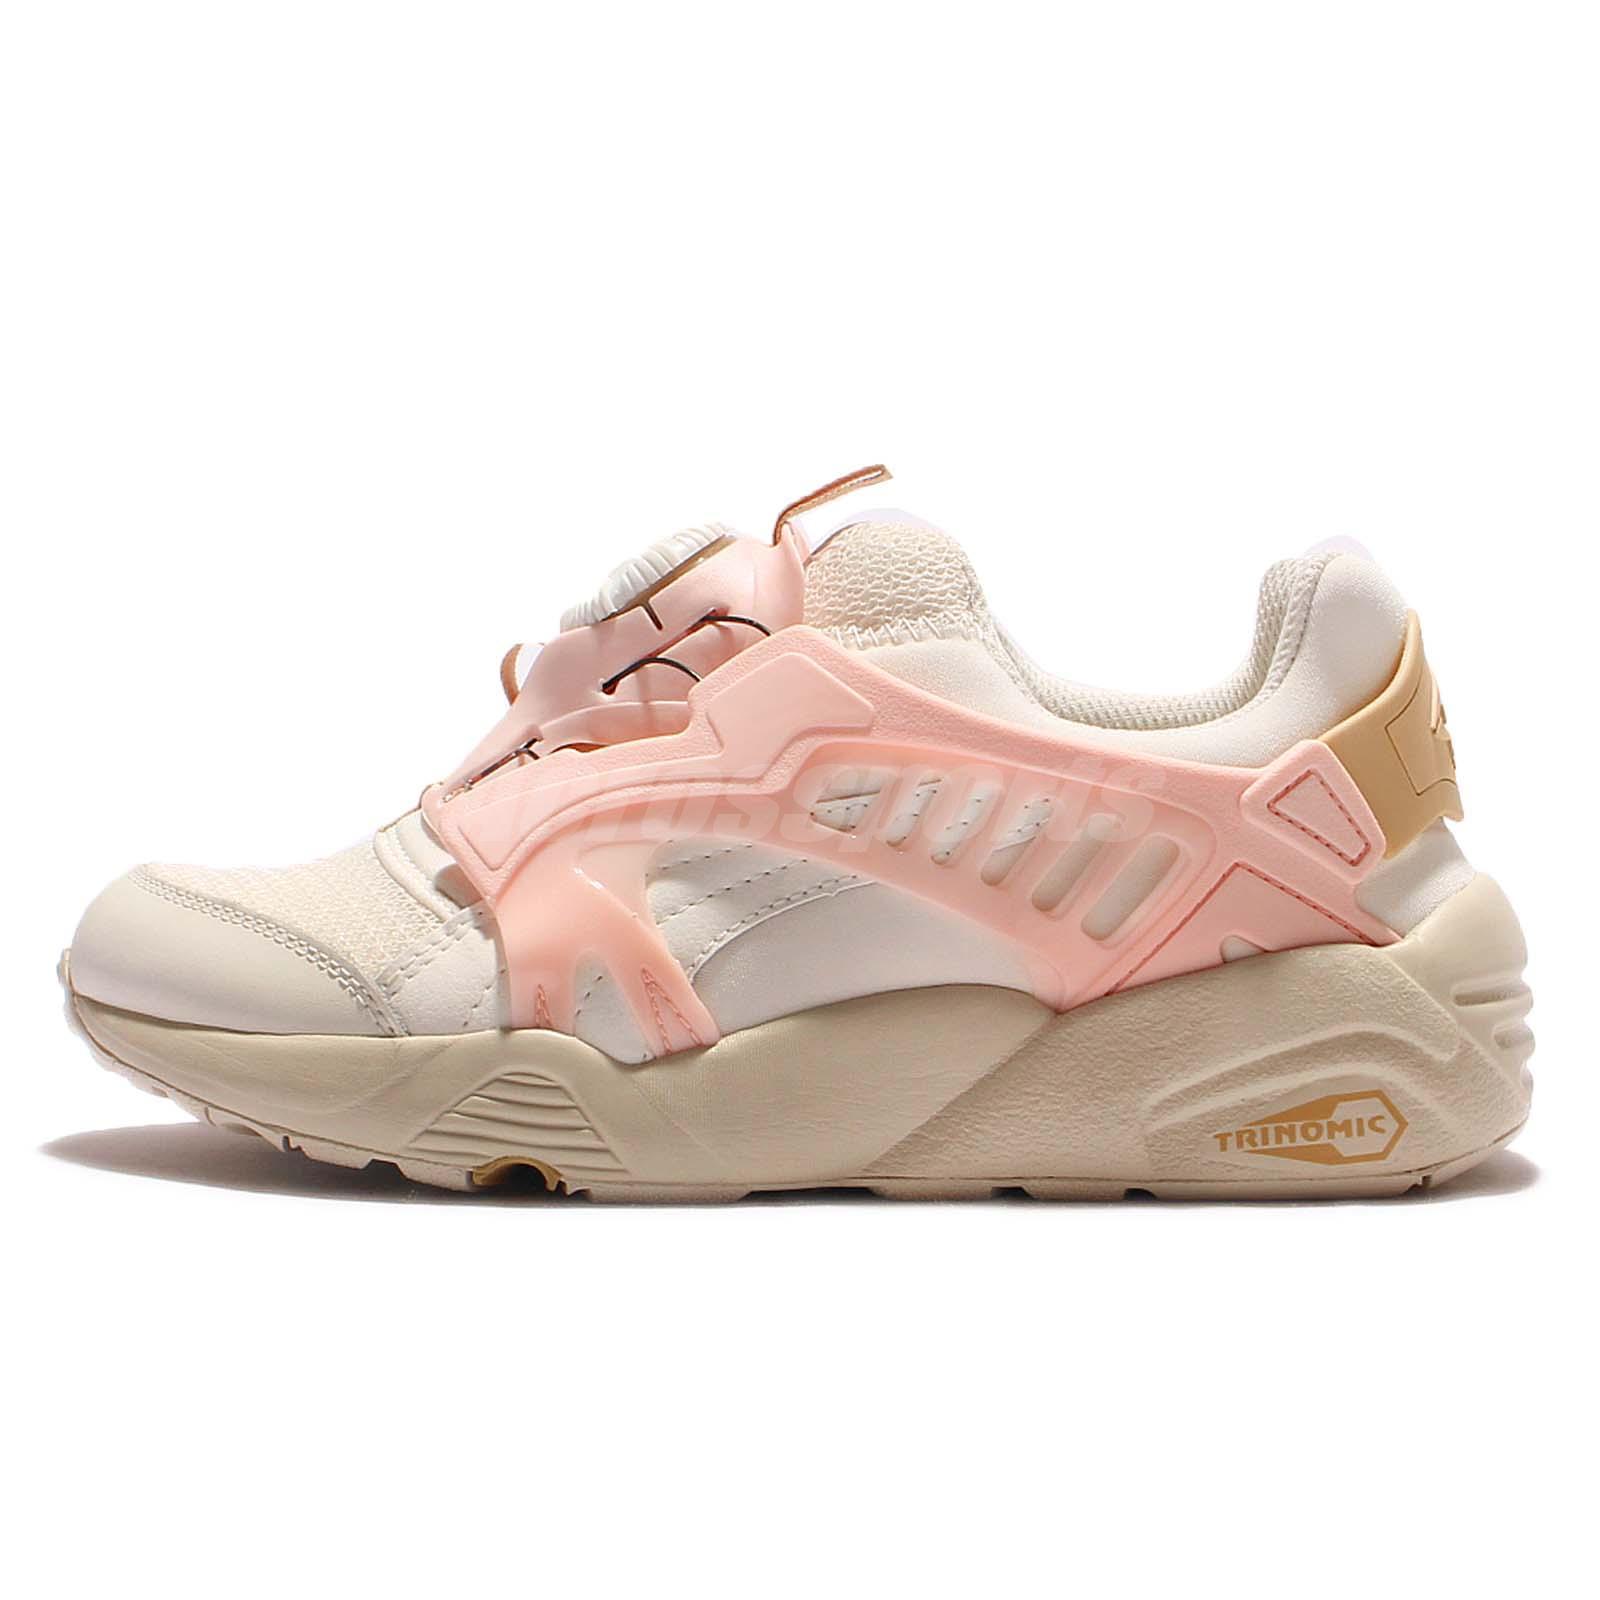 ... Puma Disc Blaze CT Beige Pink Trinomic Mens Running Shoes Sneakers  362040-05 .